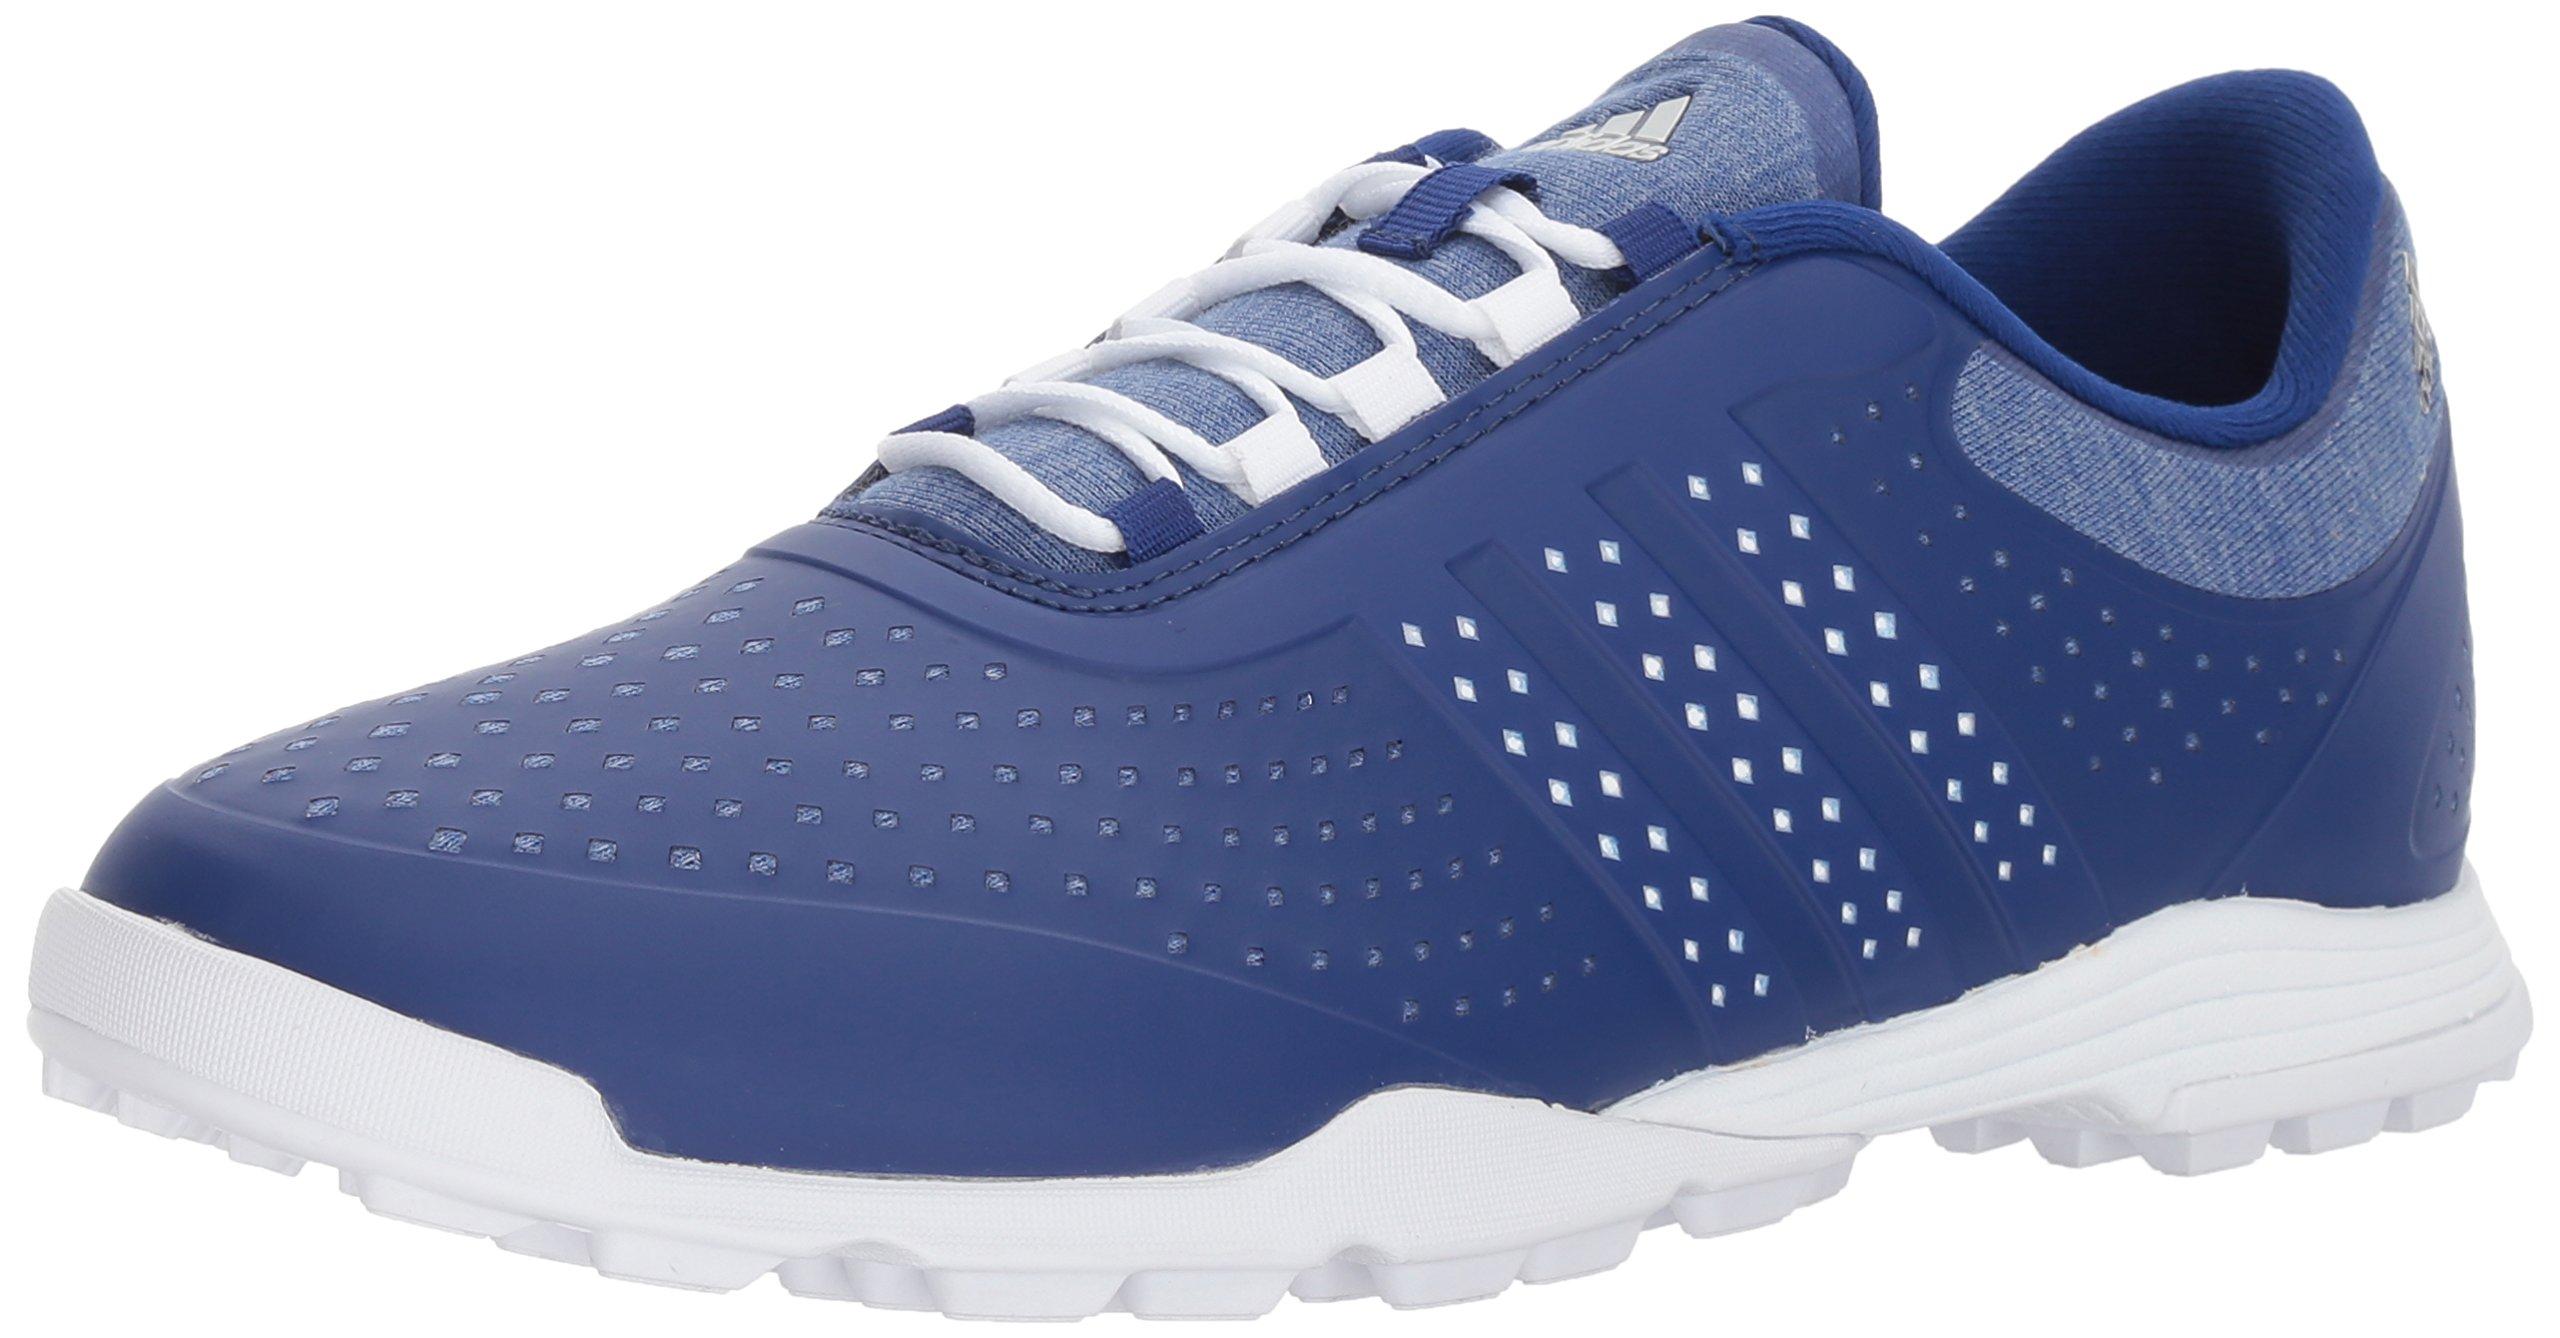 adidas Golf Women's W Adipure Sport Golf-Shoes, Mystery Ink Ftwr White/Ftwr White, 5.5 M US